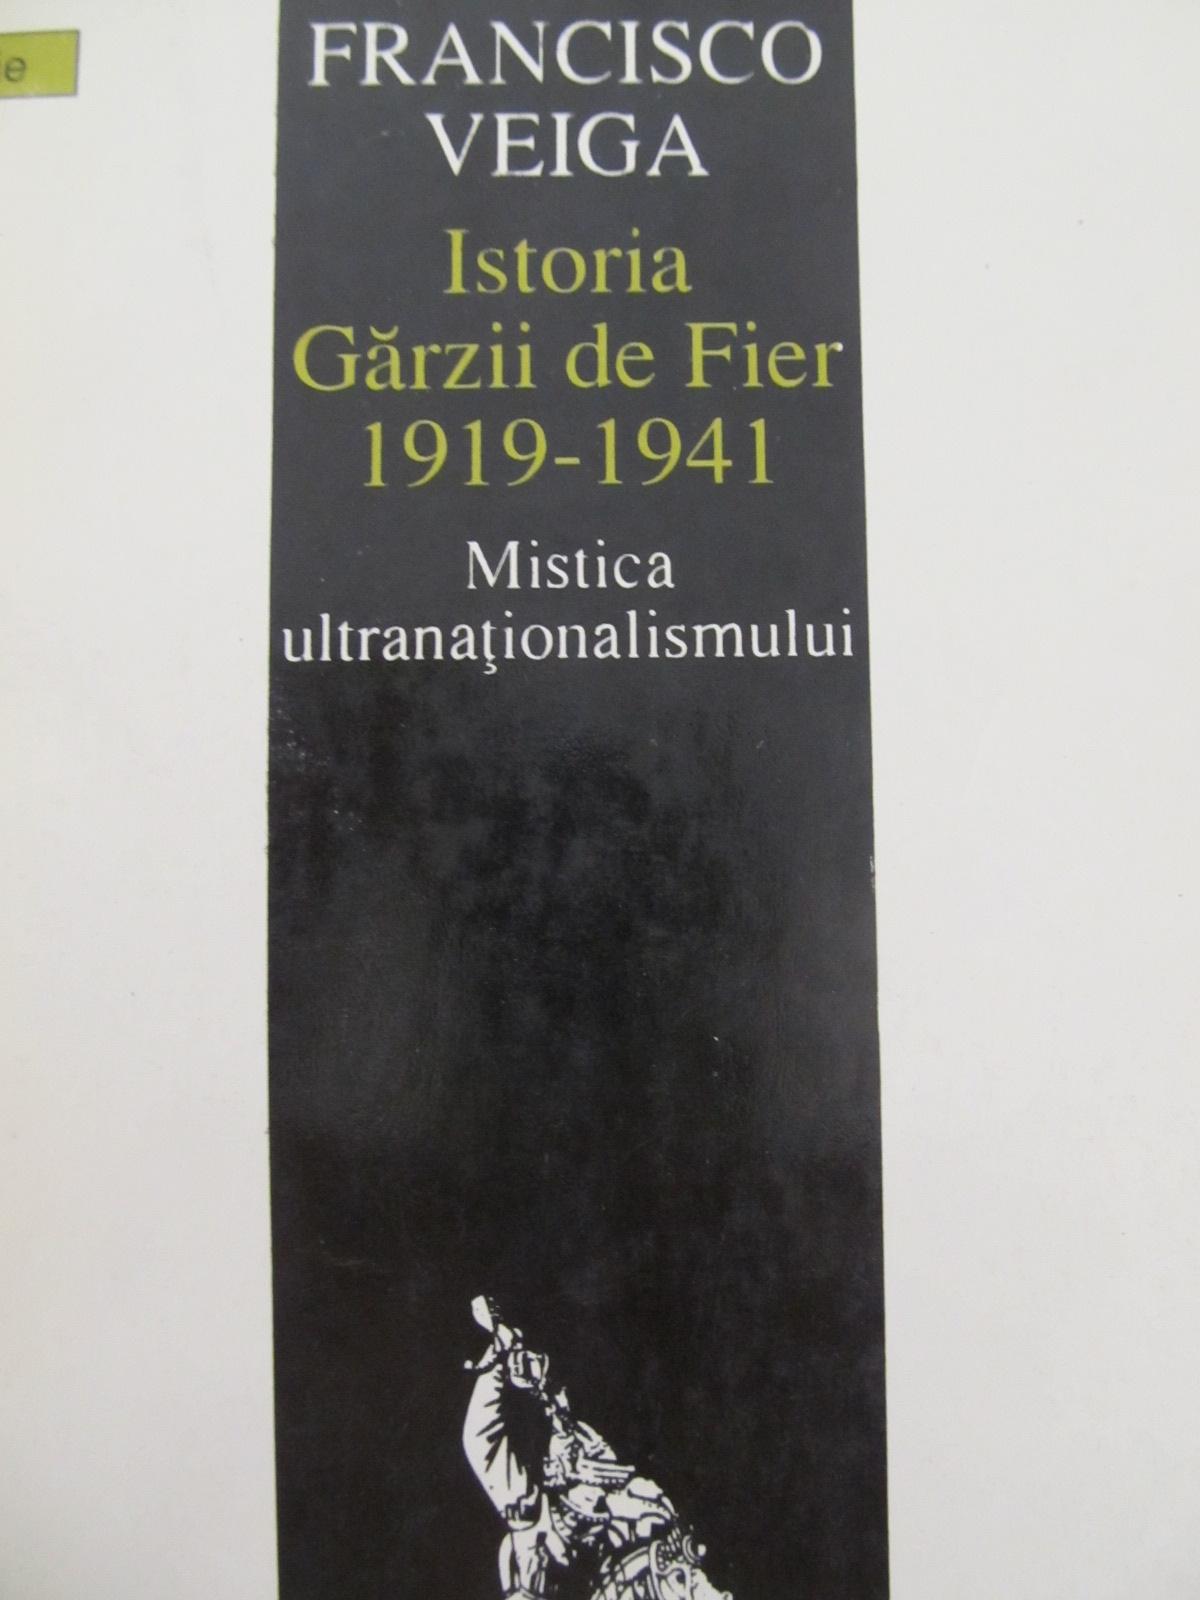 Istoria Garzii de Fier 1919 - 1941 - Mistica ultranationalismului [1] - Francisco Veiga | Detalii carte